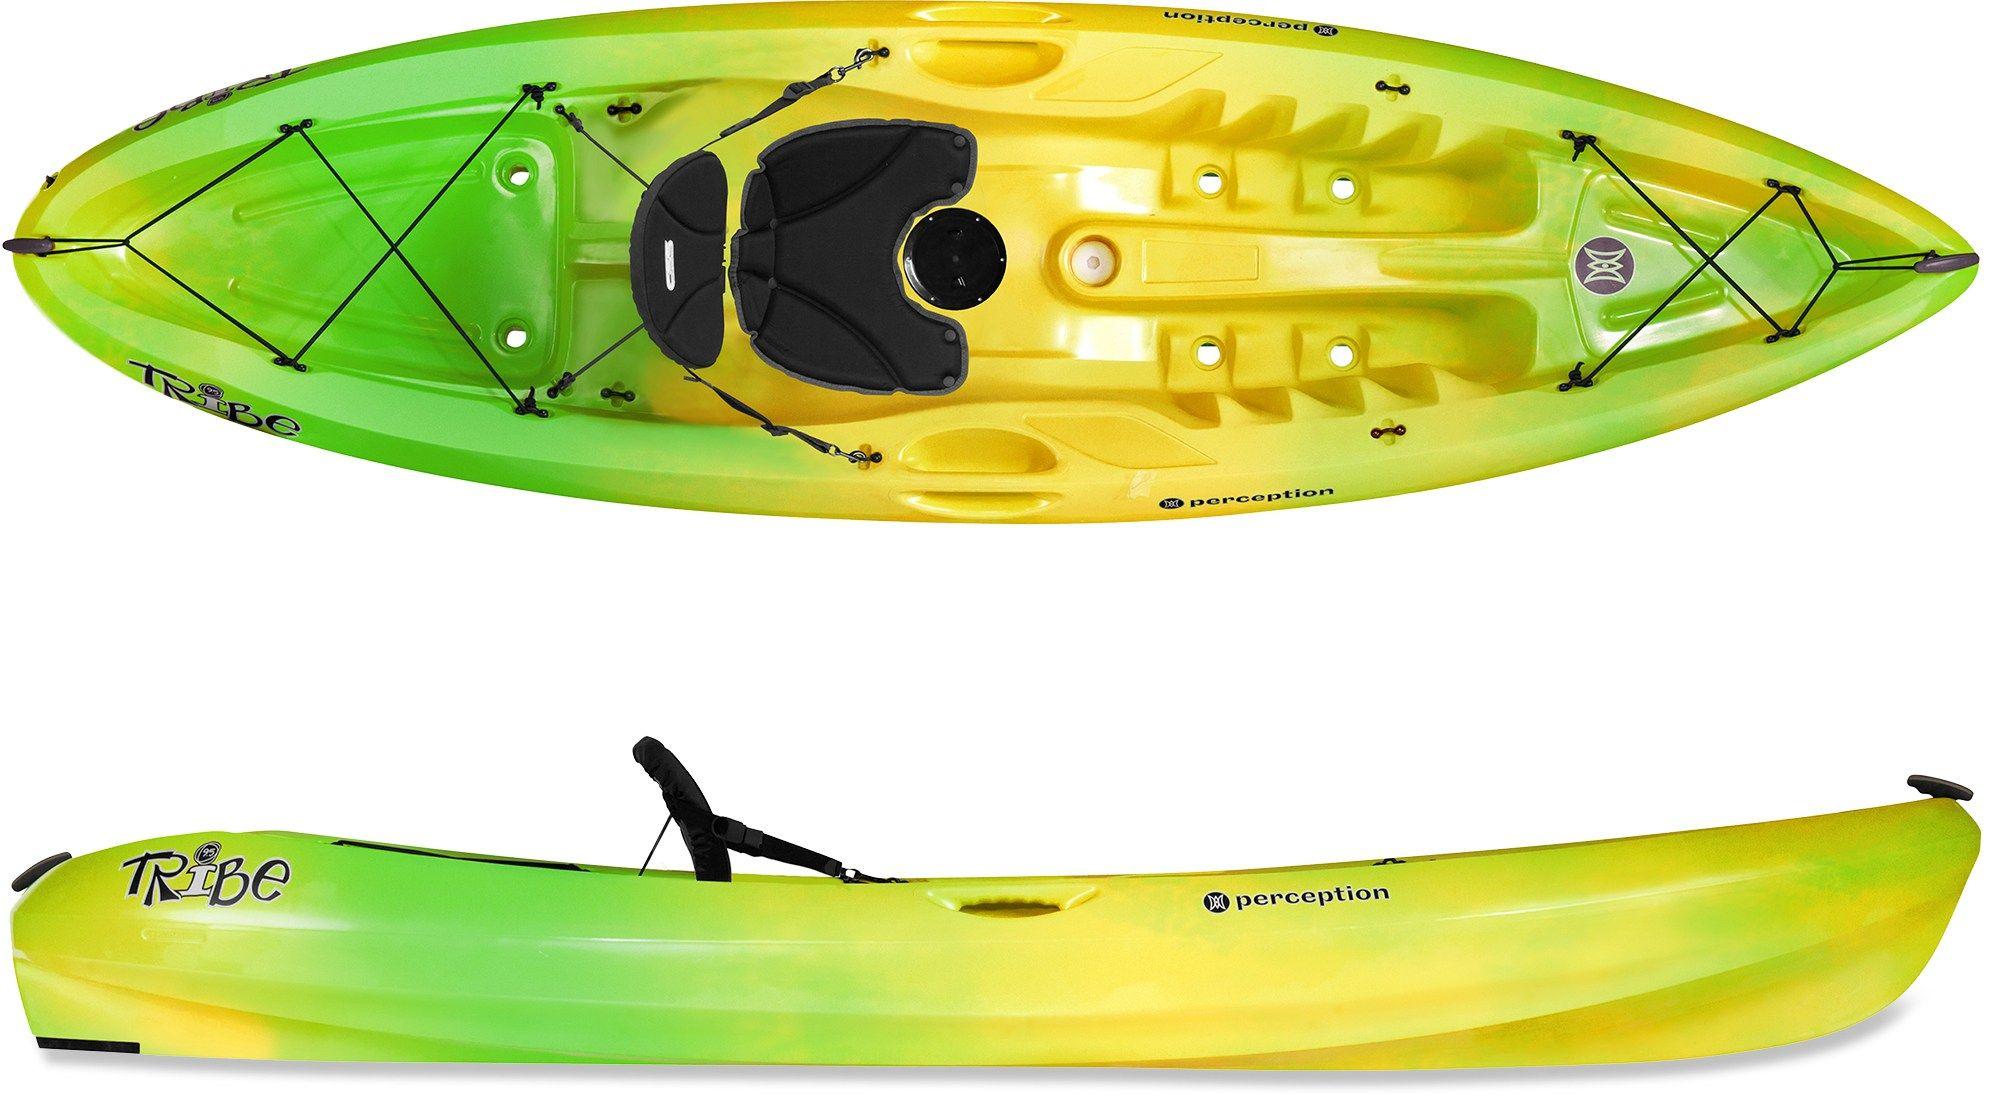 Perception Tribe 9.5 SitOnTop Kayak Sea Spray 9 Ft 5 In